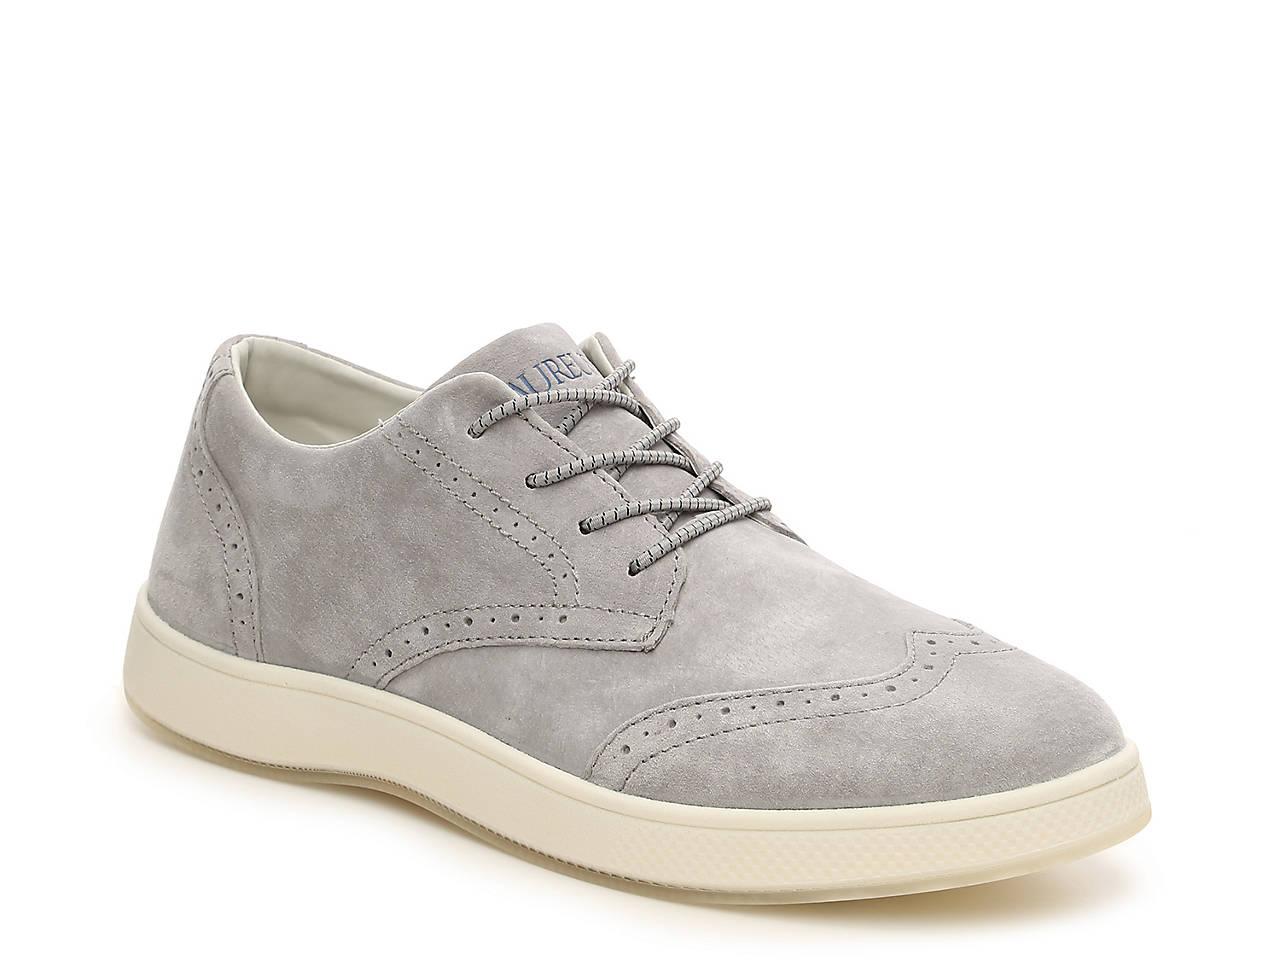 df970765a3e4 Aureus Supra Slip-On Sneaker Men s Shoes